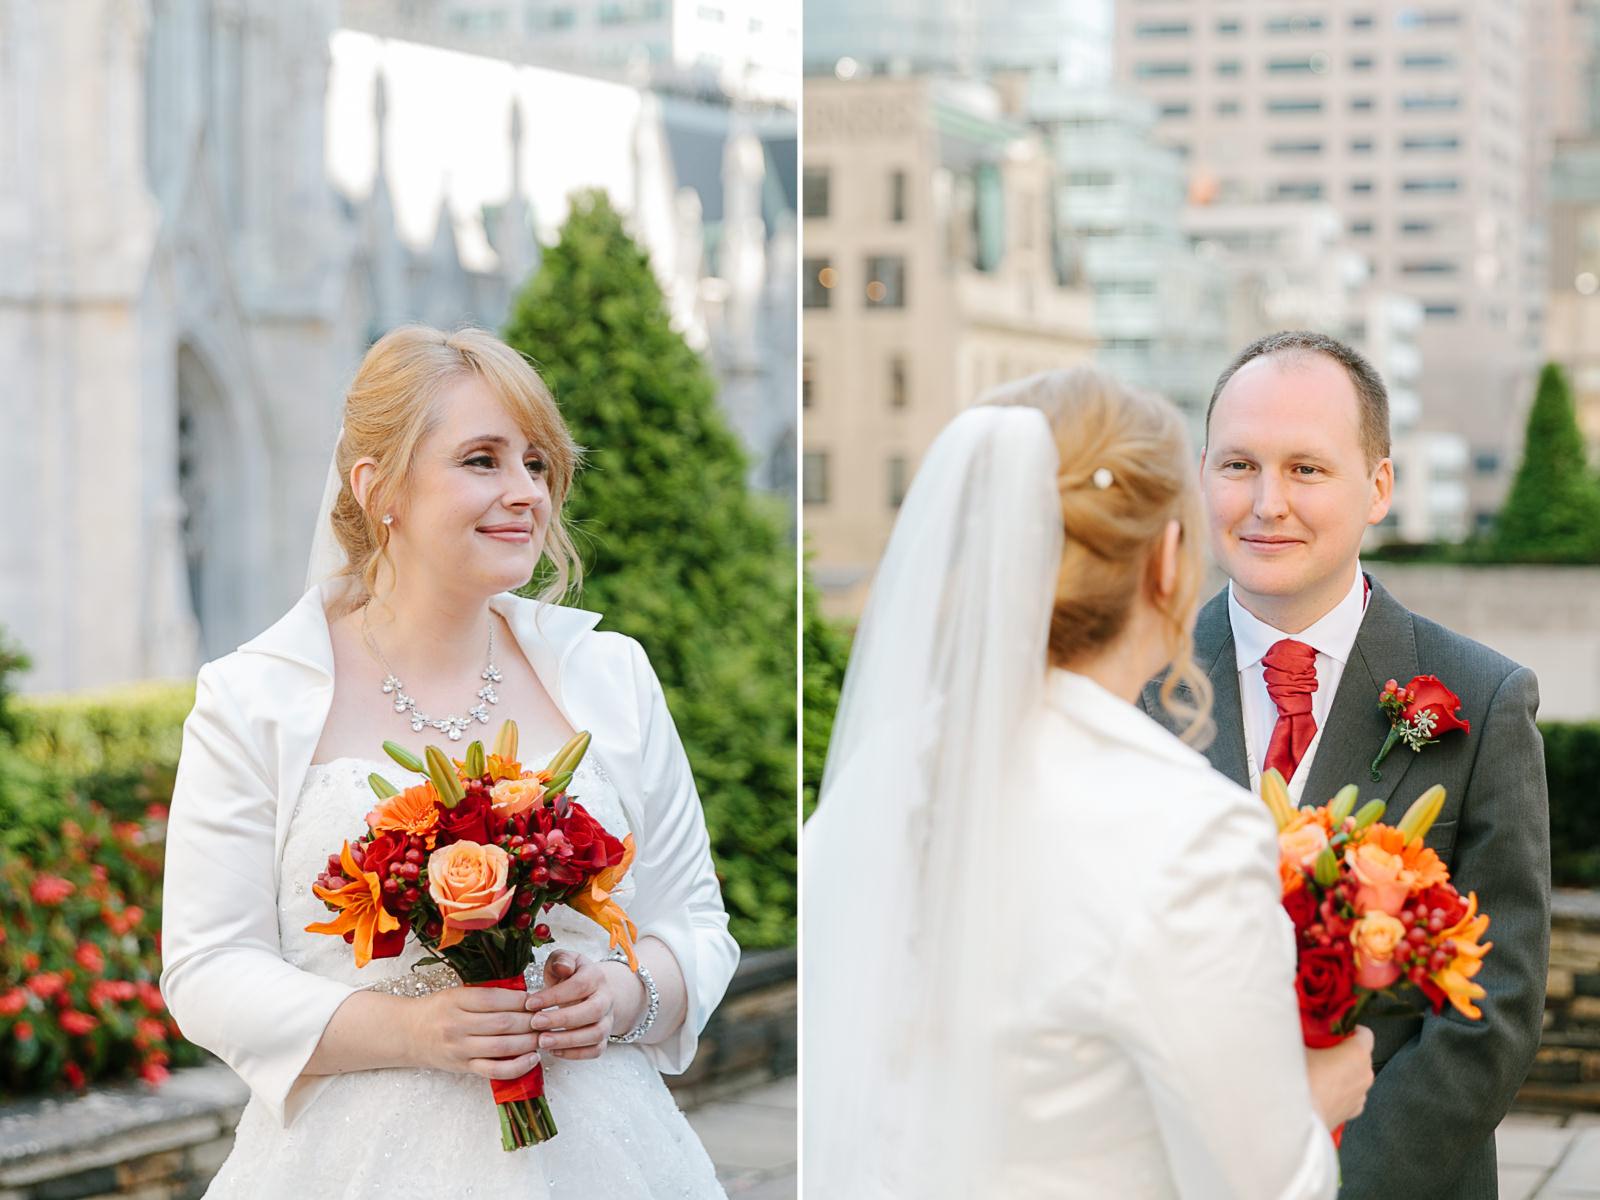 620 Loft&garden-intimate-wedding-4.jpg